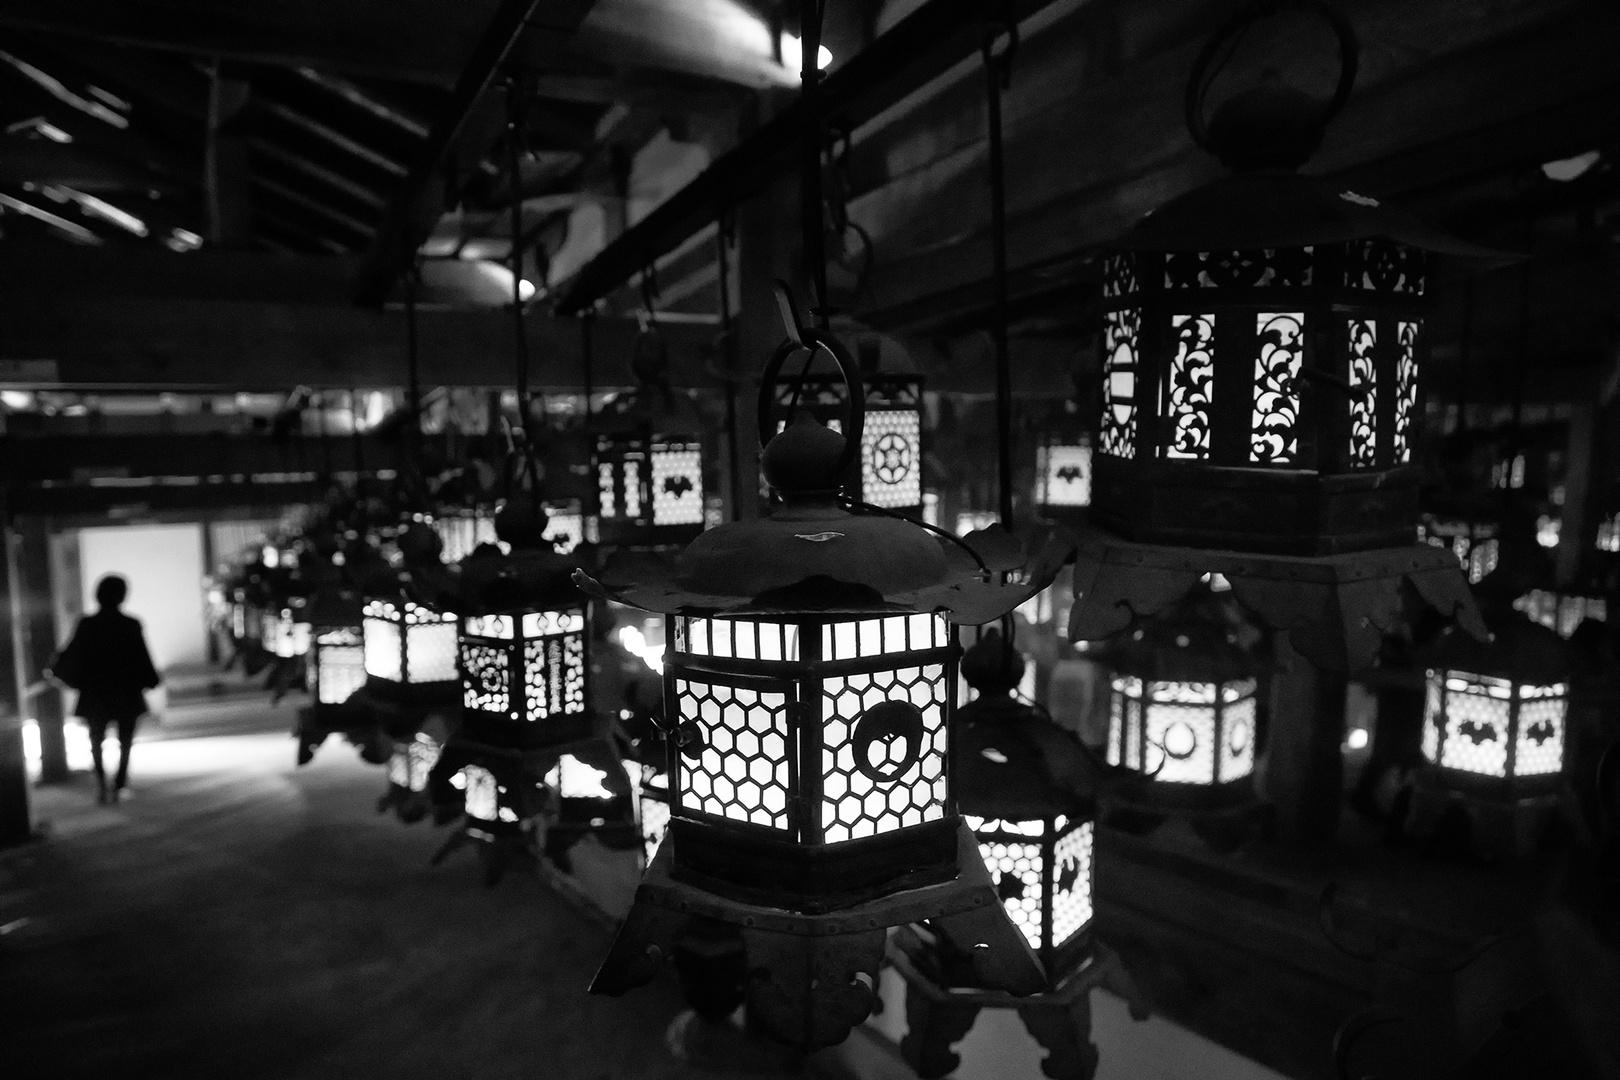 Ranpu - Auf die Lampe!